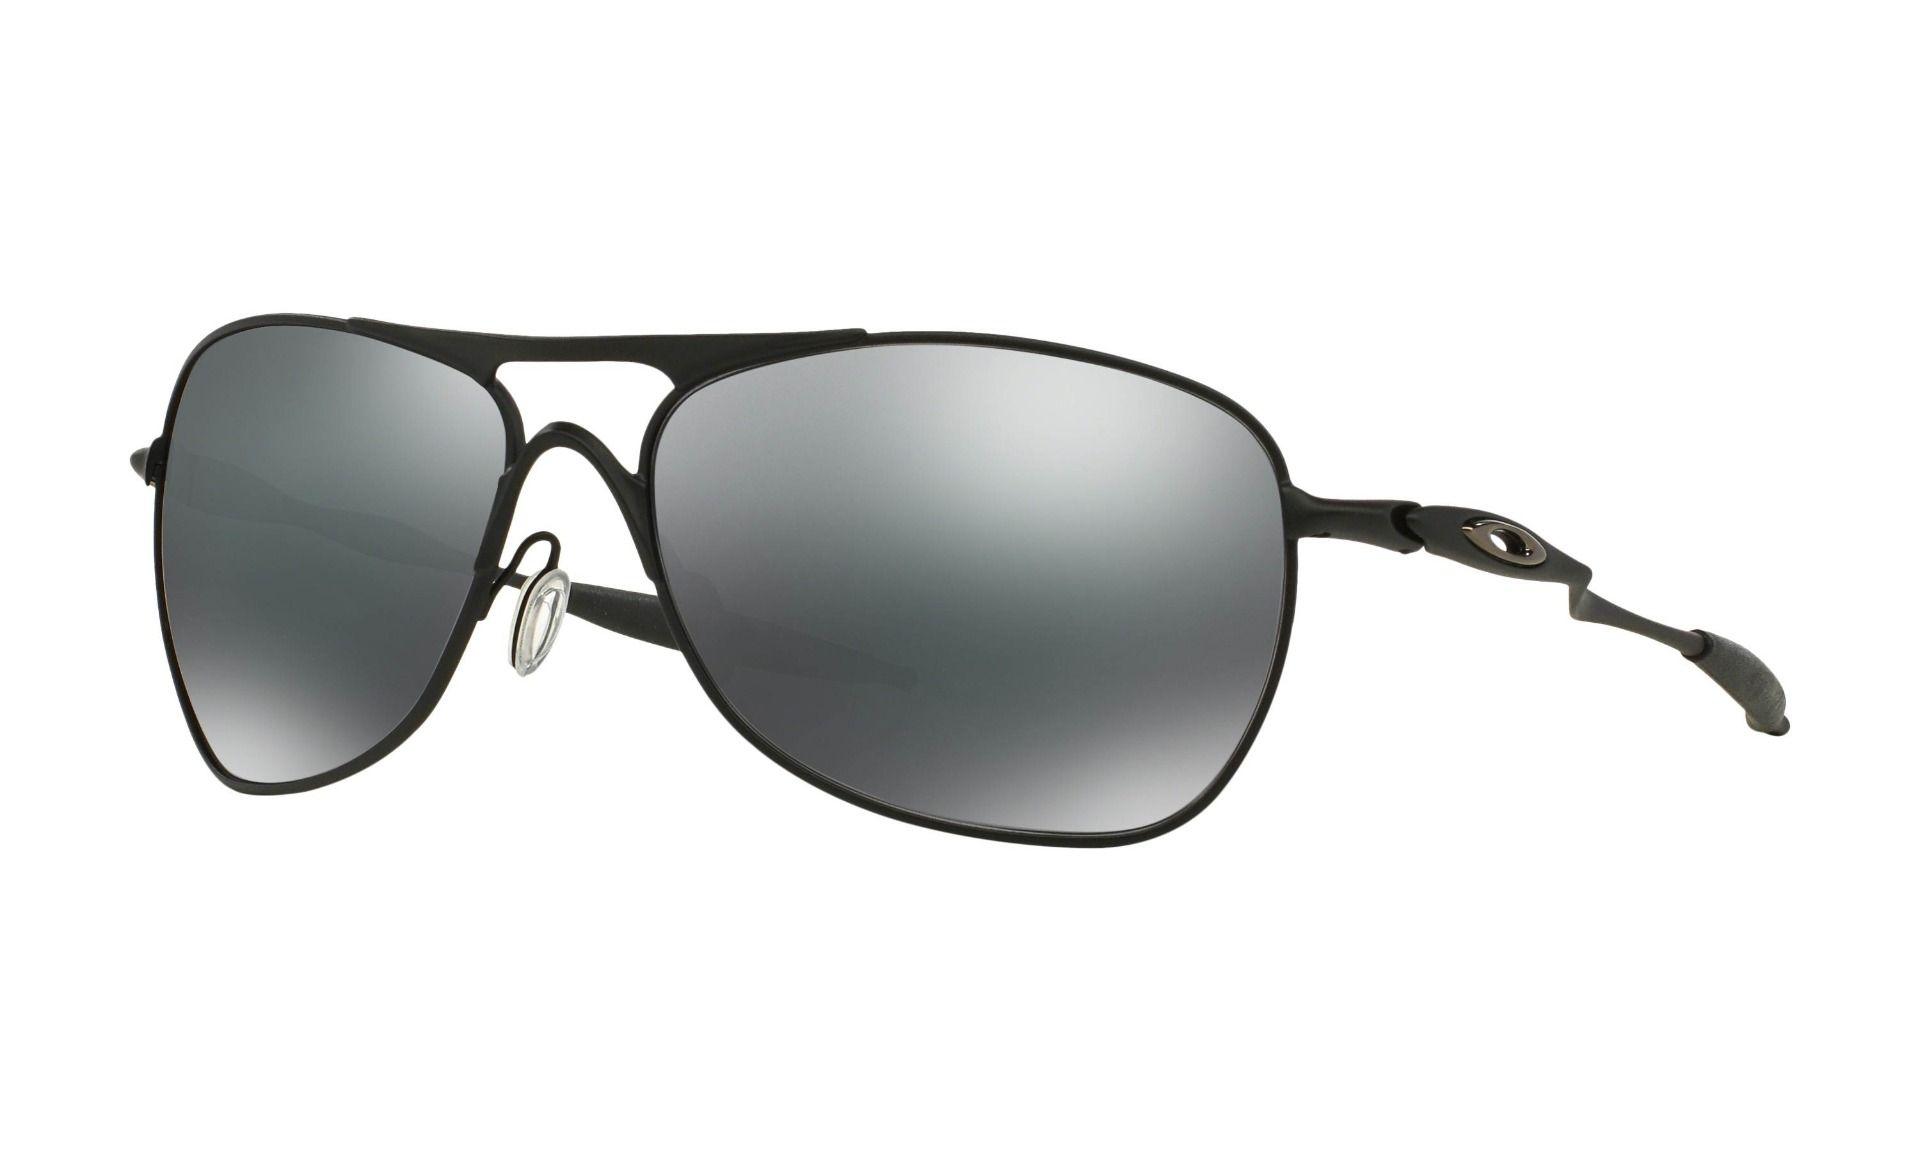 b4ff29a96e6 Oakley Crosshair Sunglasses